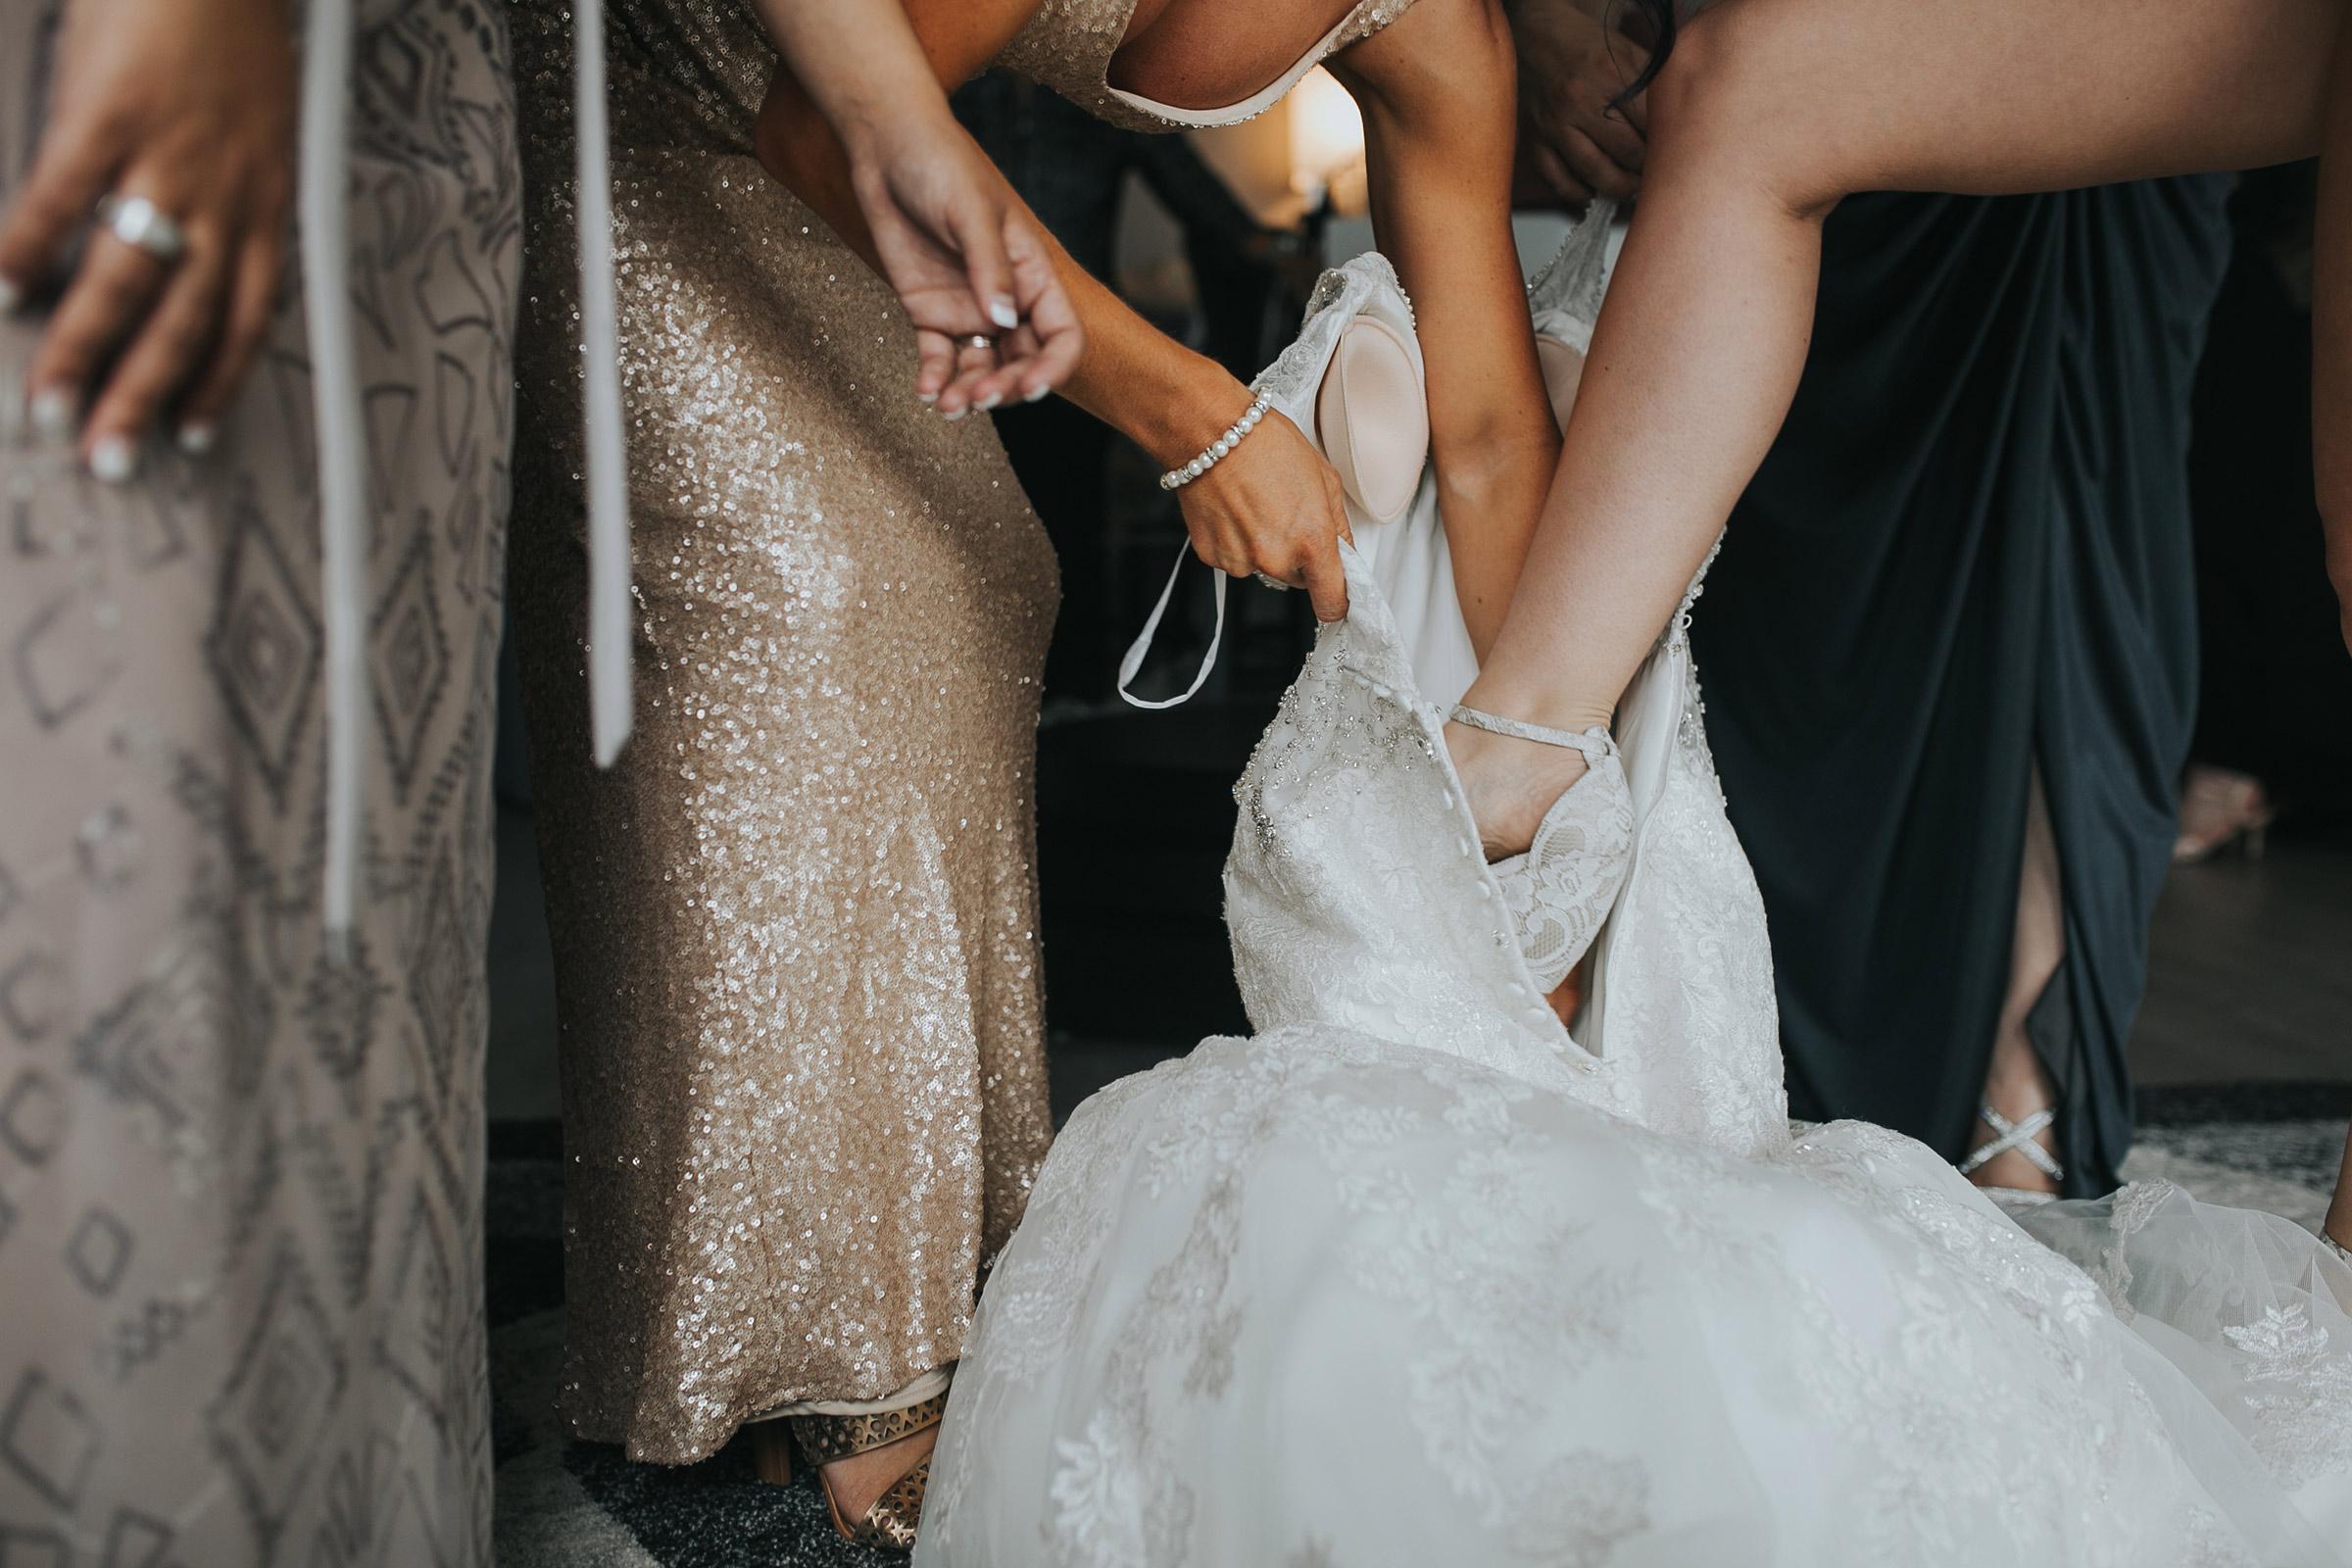 bridesmaids-helping-bride-step-into-dress-desmoines-iowa-ac-hotel-raelyn-ramey-photography.jpg